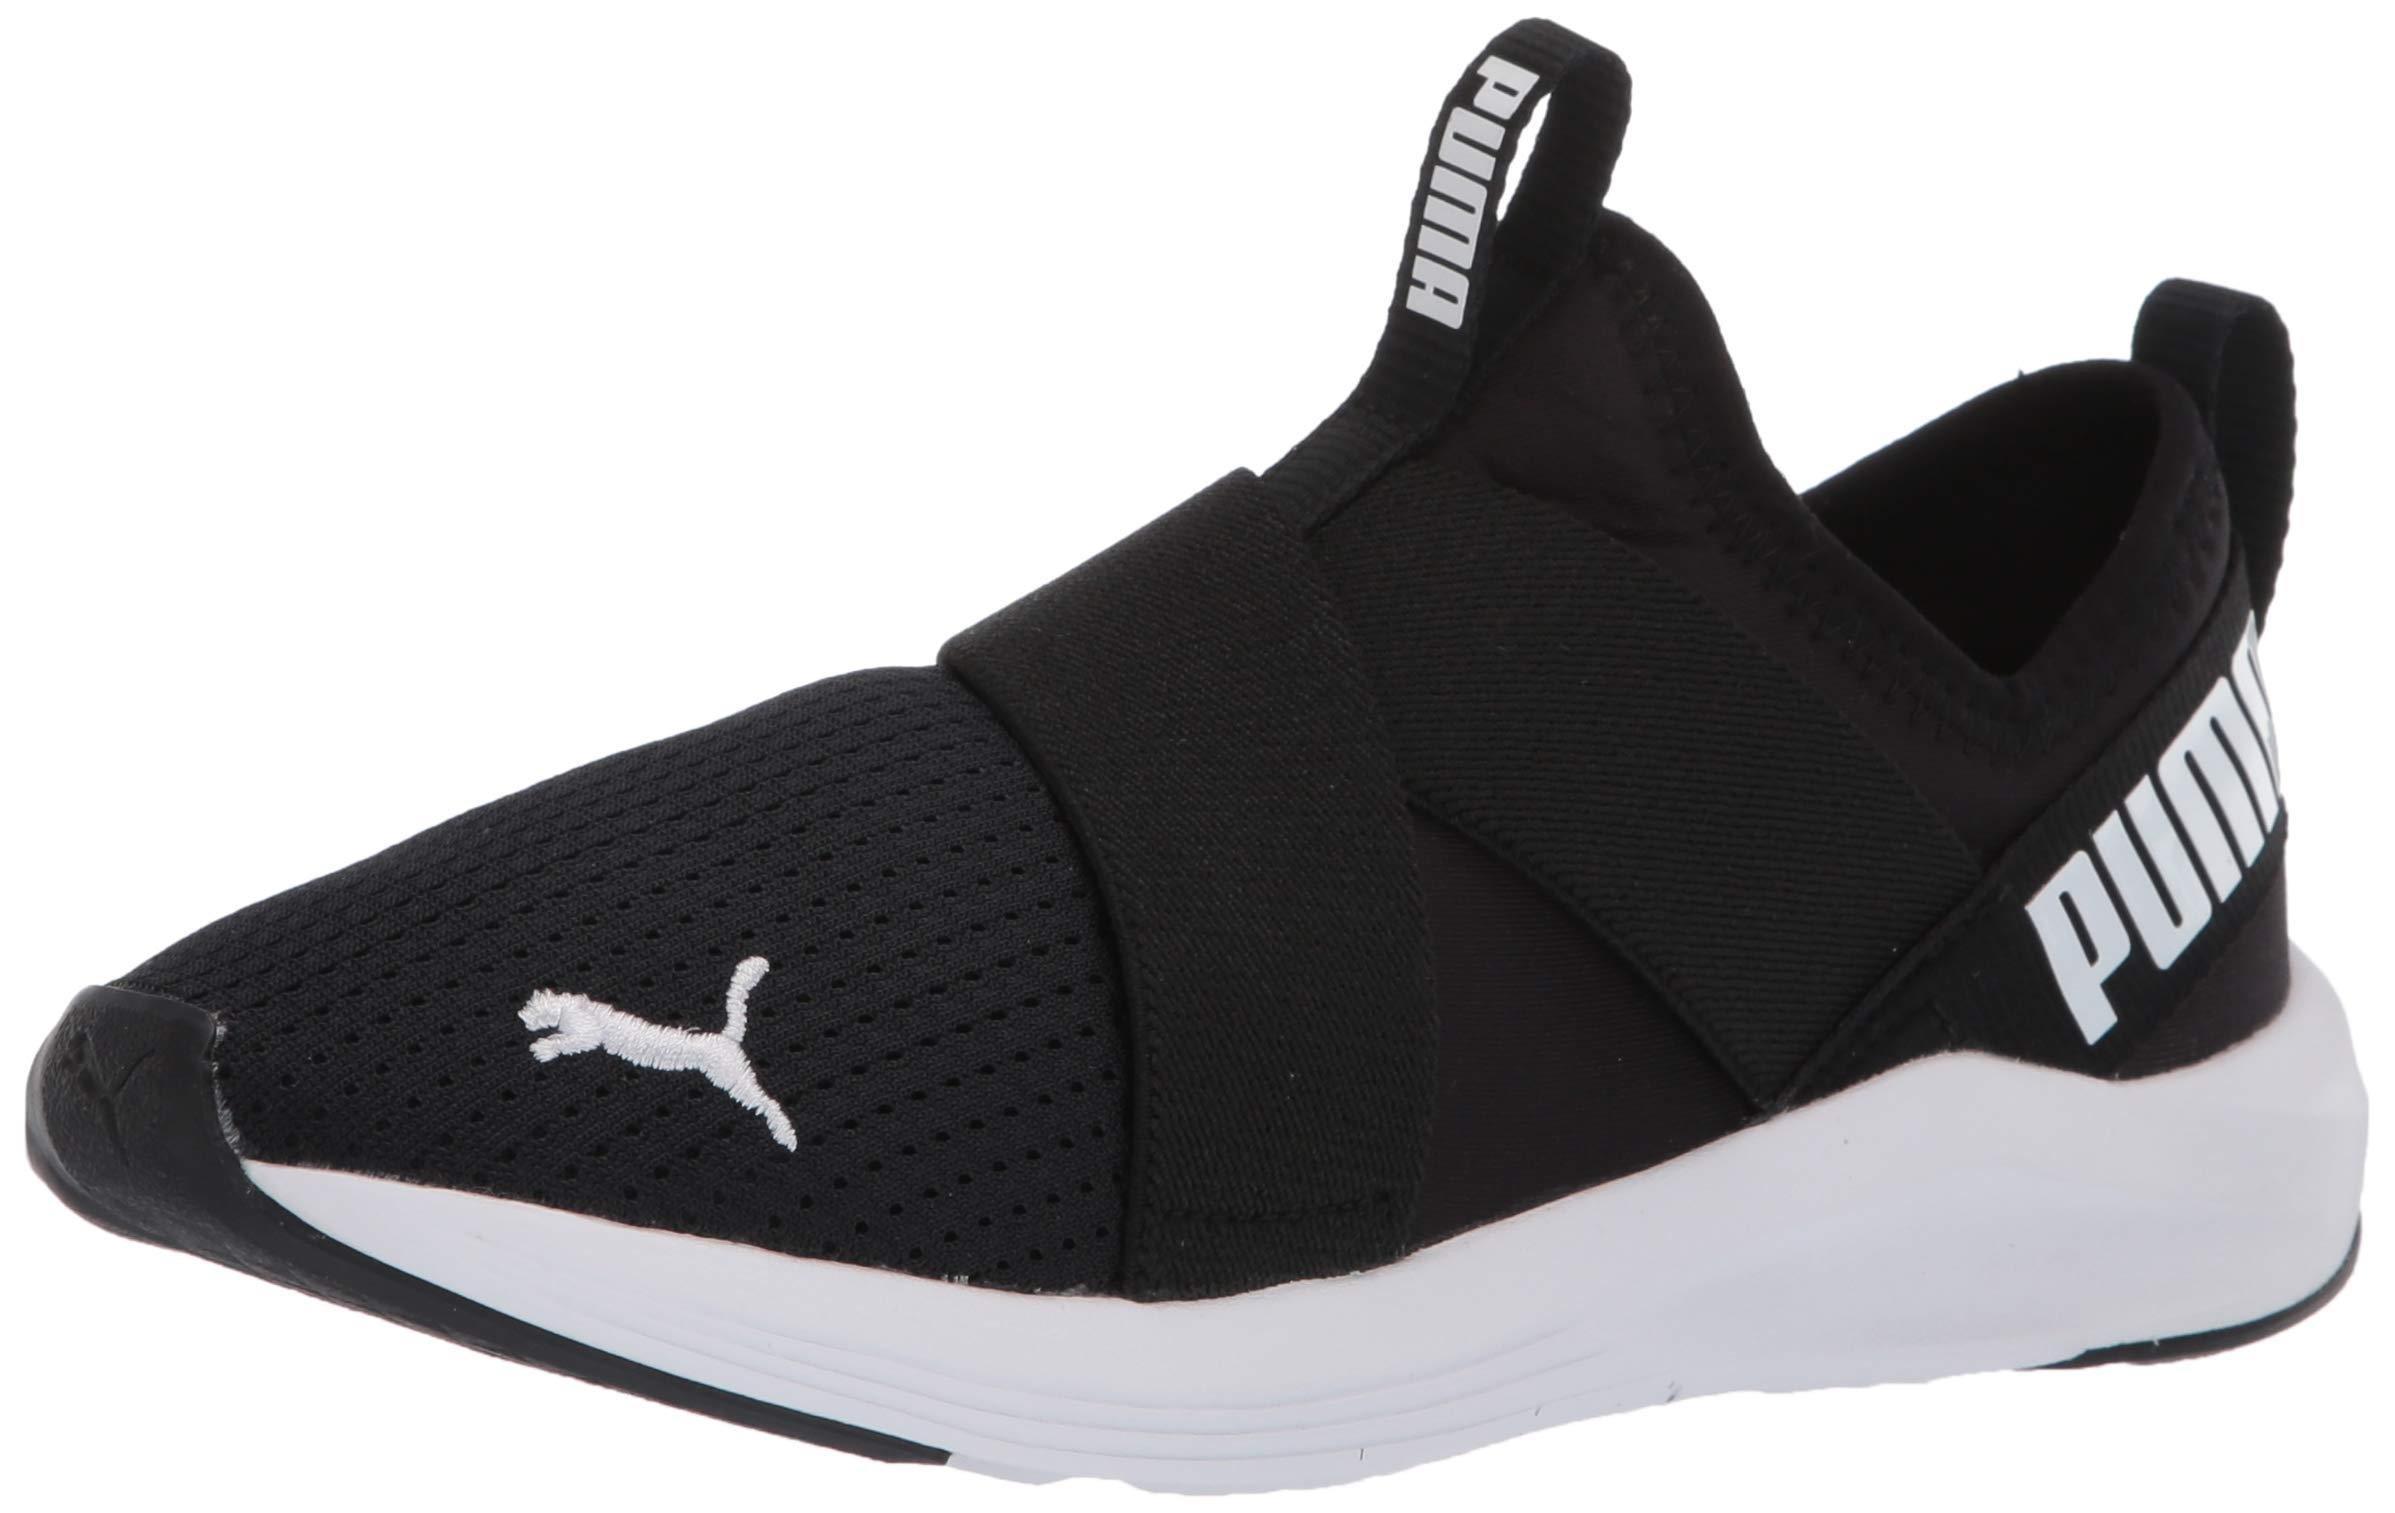 PUMA Prowl Slip On Sneaker in Black